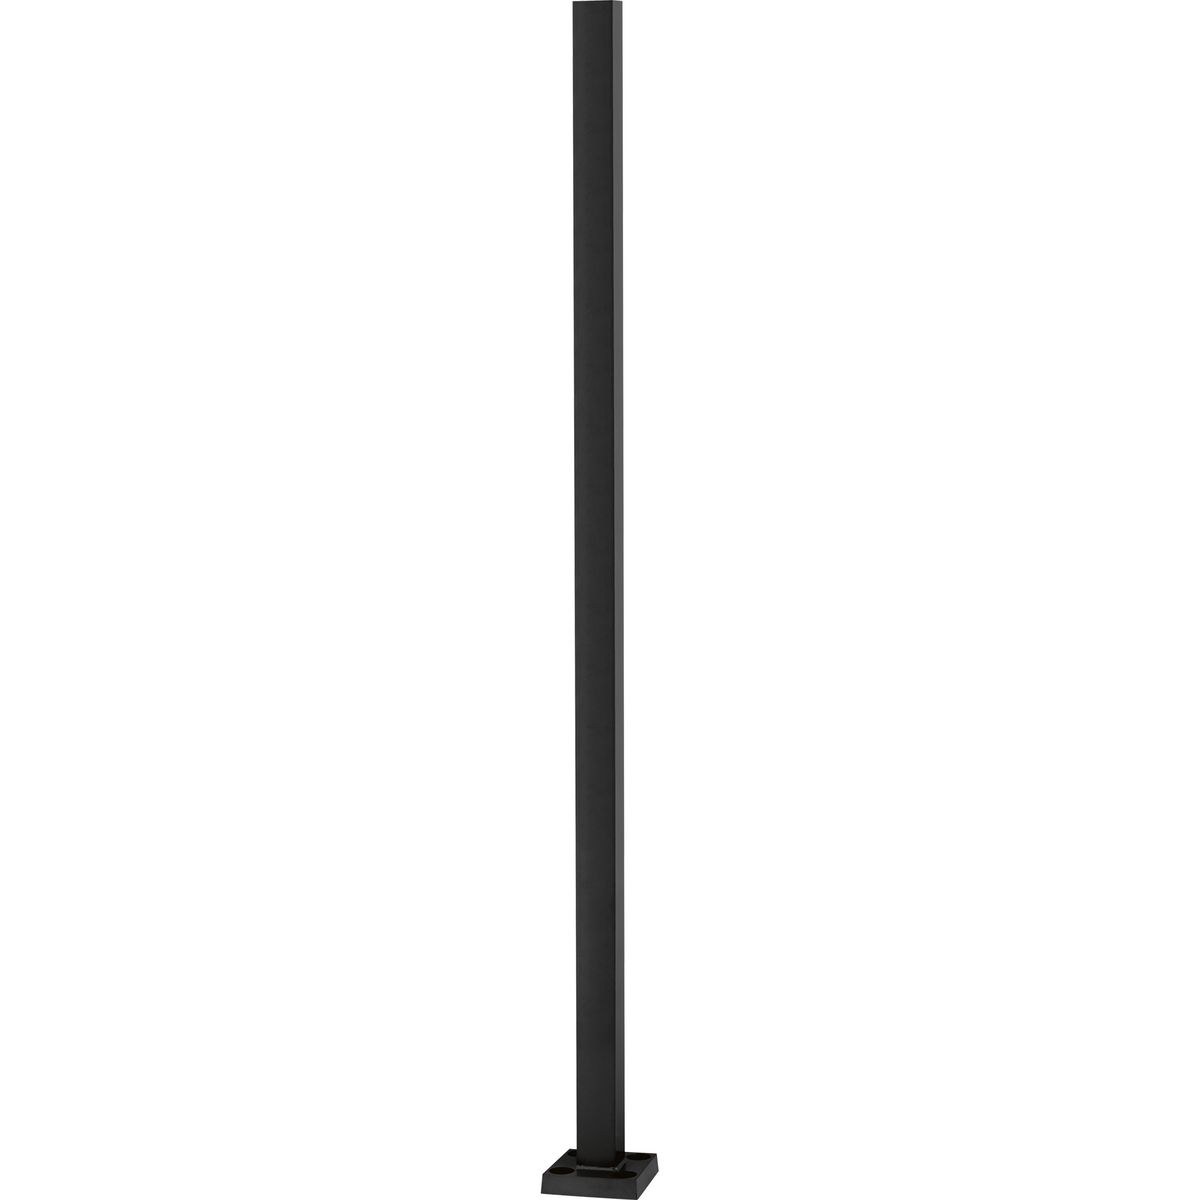 Square Straight Steel Pole